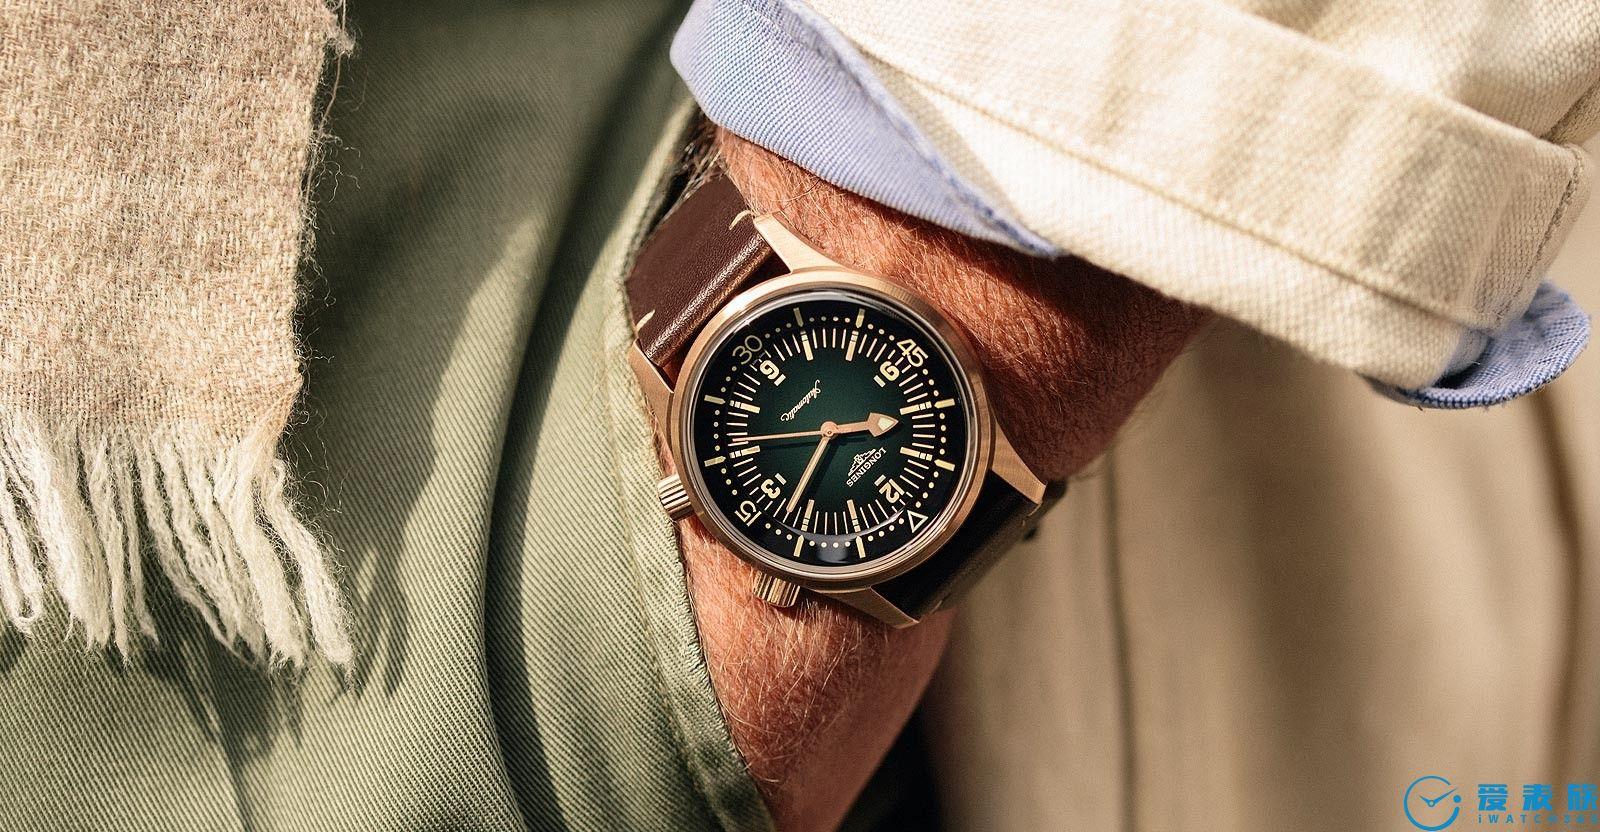 浪琴總算趕上青銅浪潮---Legend Diver青銅手表